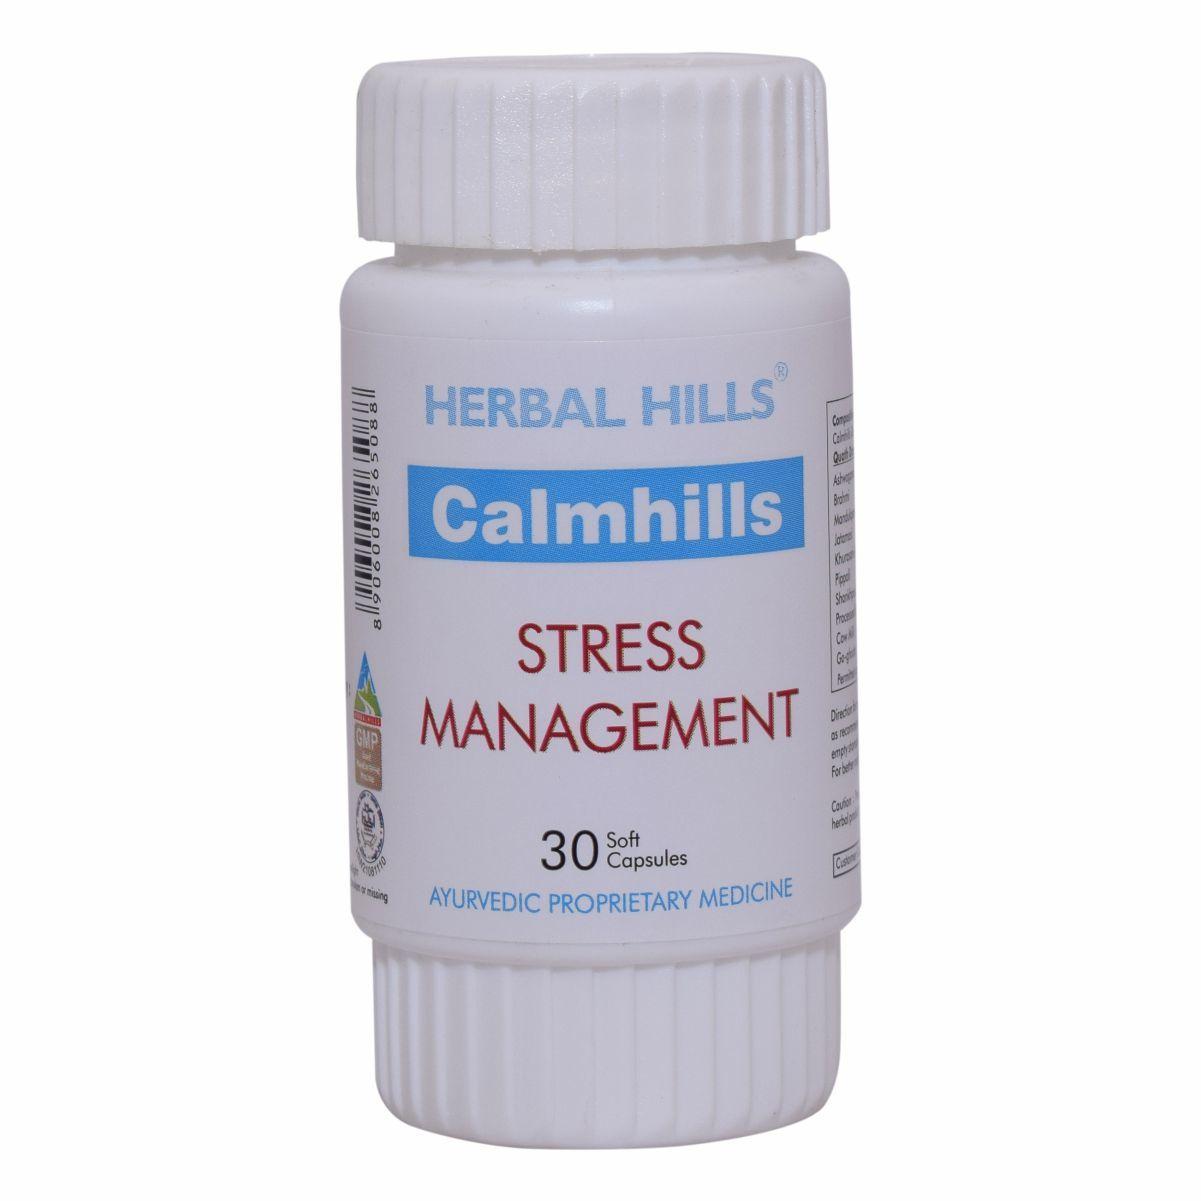 Ayurvedic Medicine for Stress and Depression - Calmhills 30 capsule